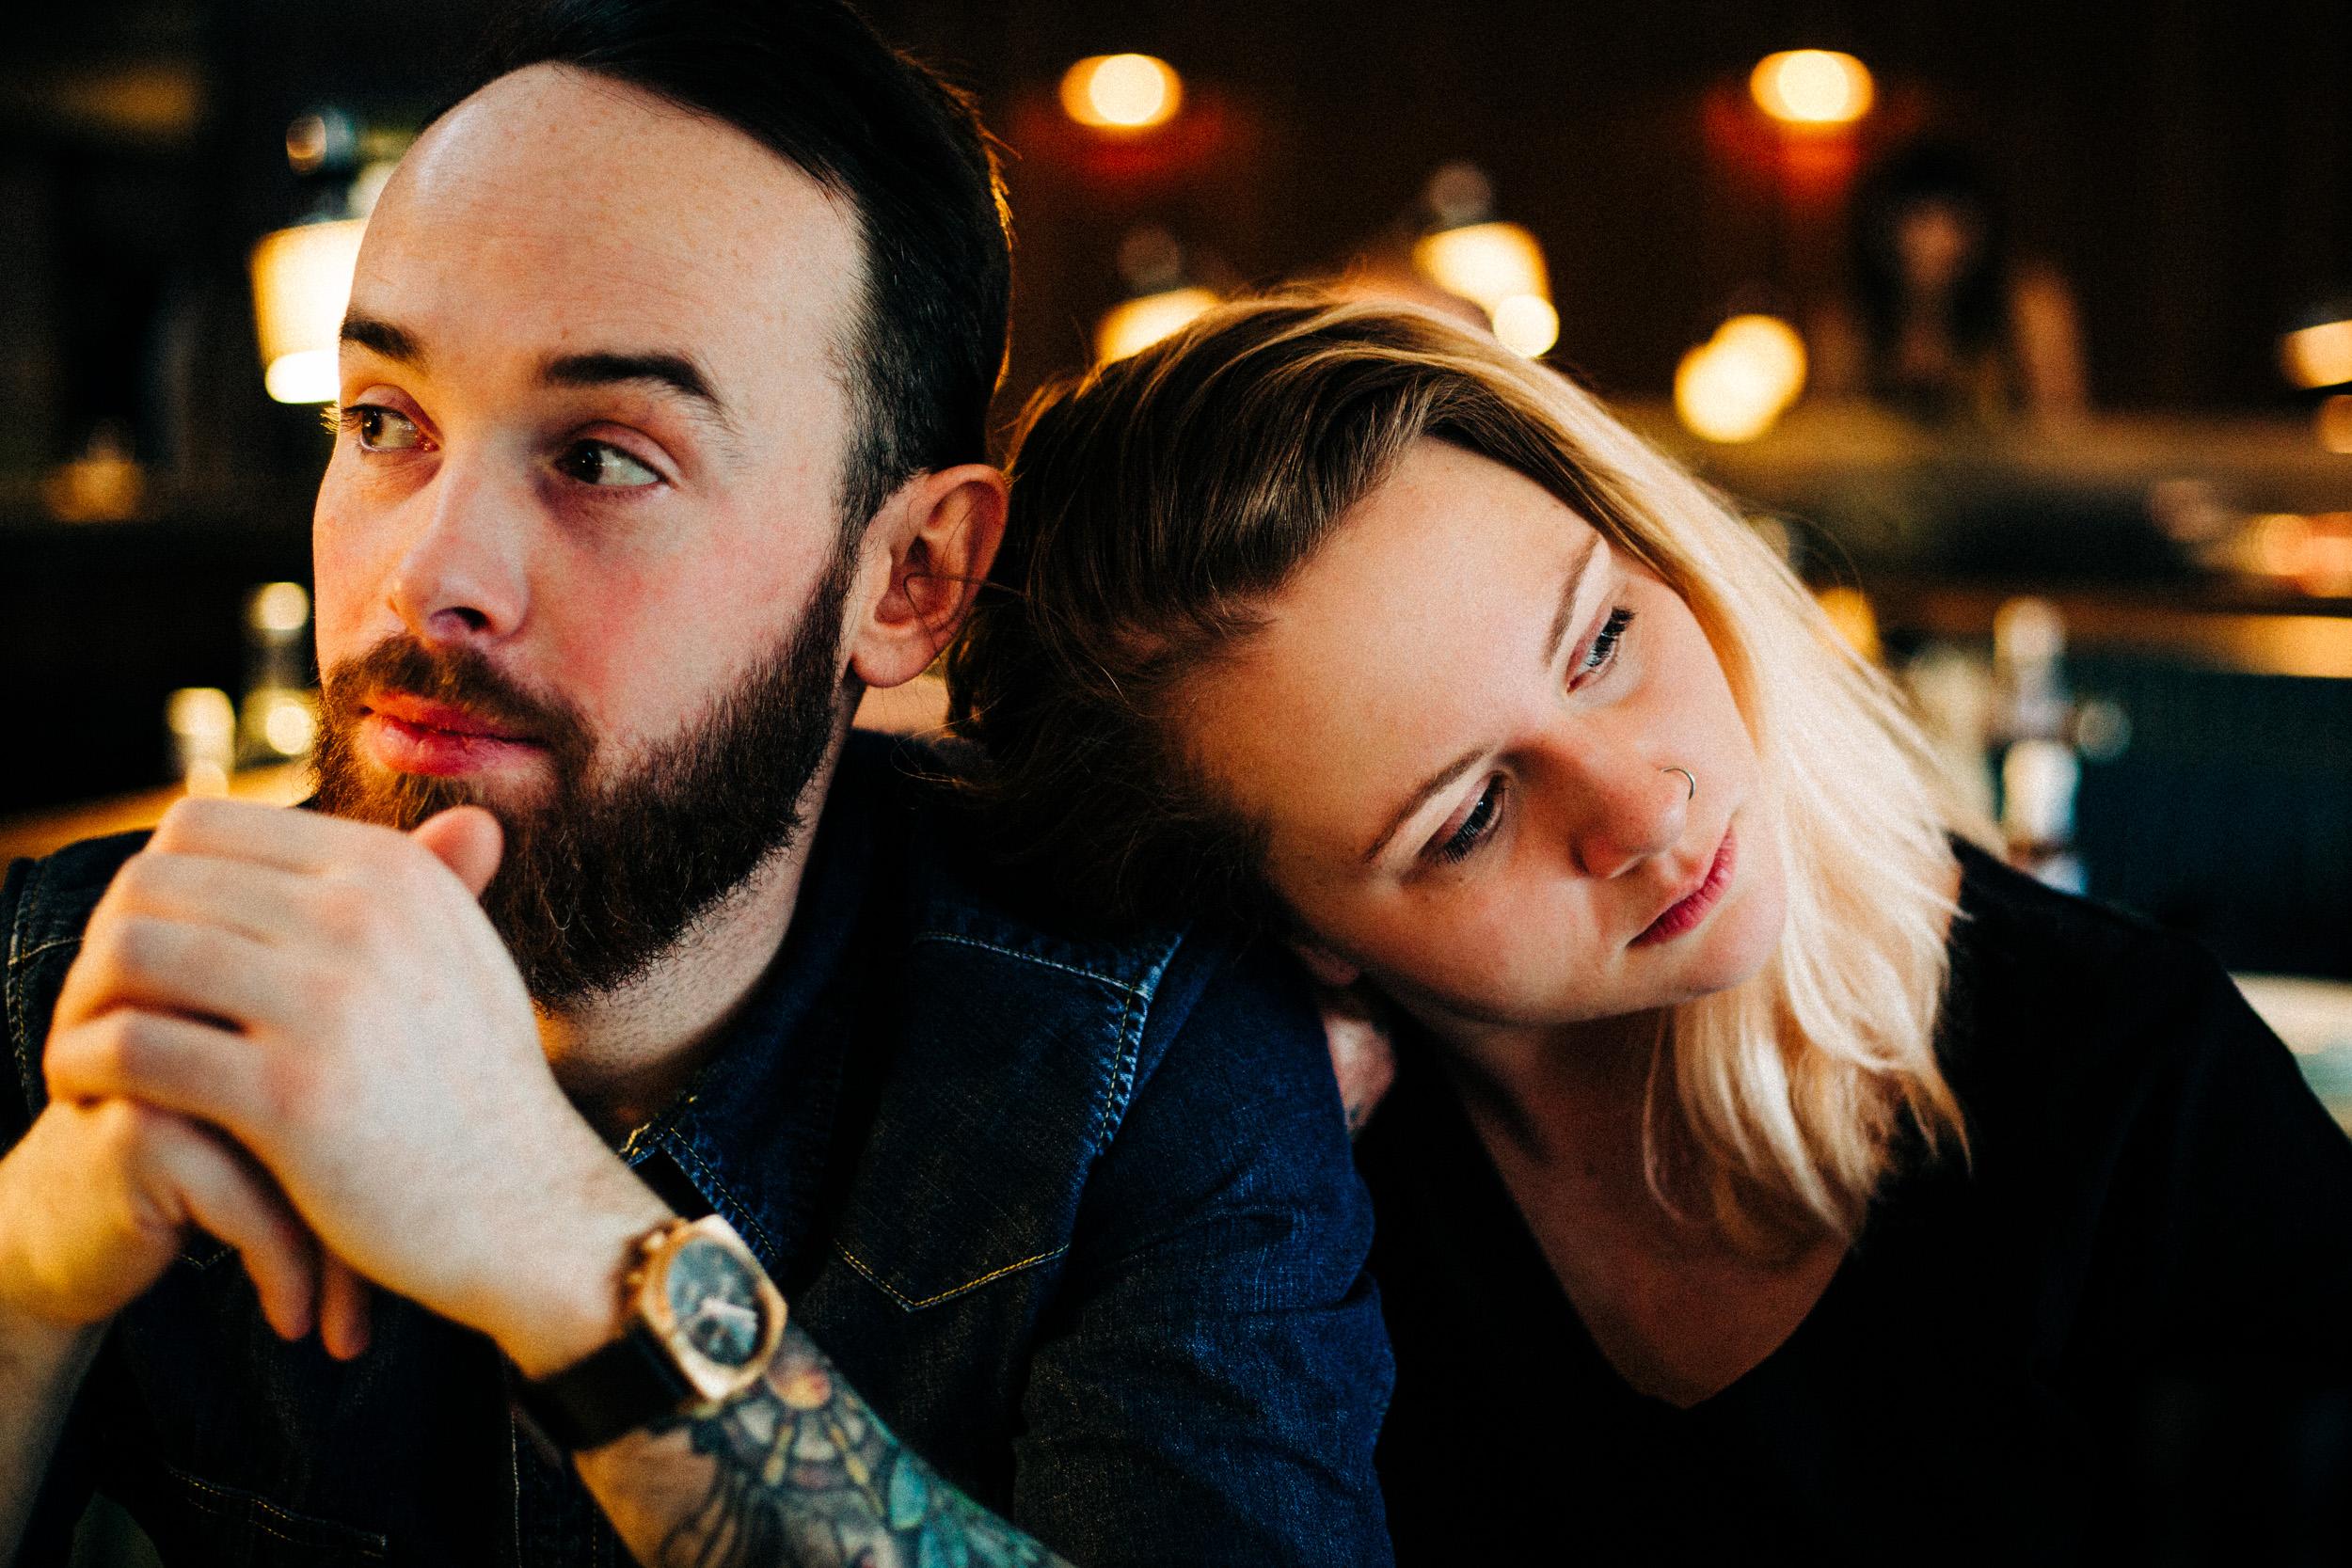 Cardiff Photographer Alex Sedgmond - Photography South Wales - Mollies Motel Oxfordshire Couple Photography-5.jpg